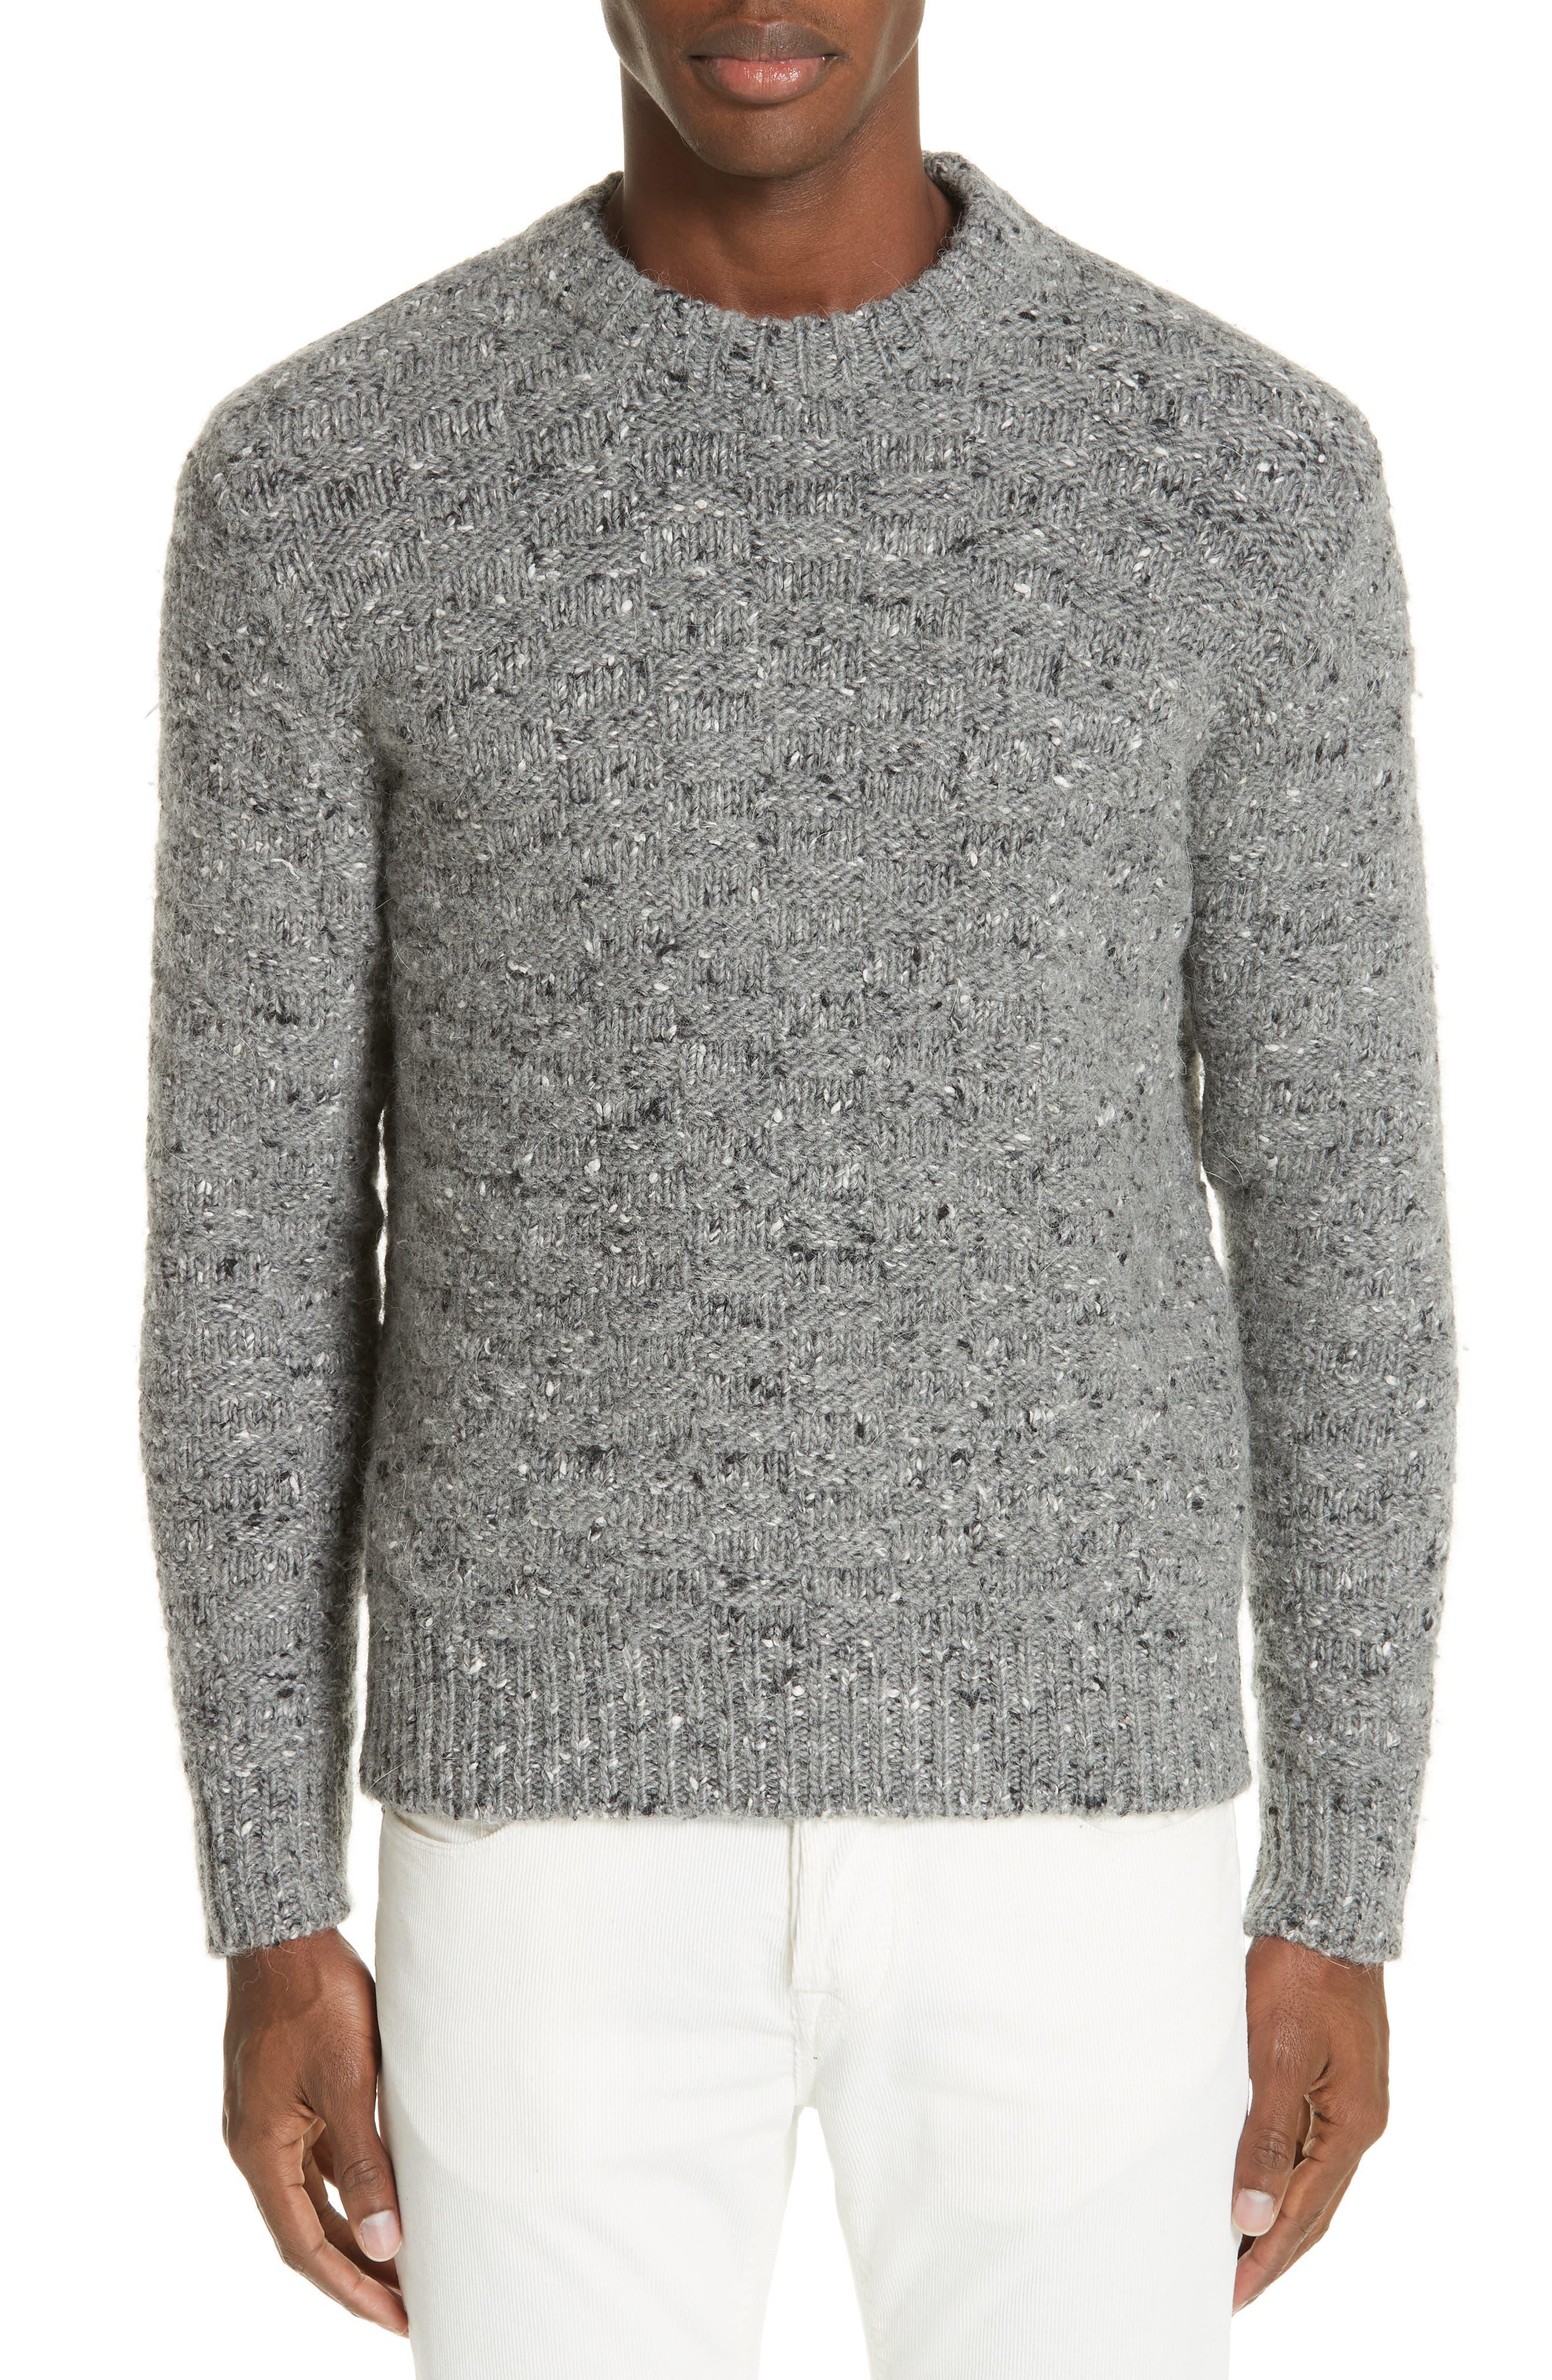 Wool Blend Crewneck Sweater,                             Main thumbnail 1, color,                             GREY